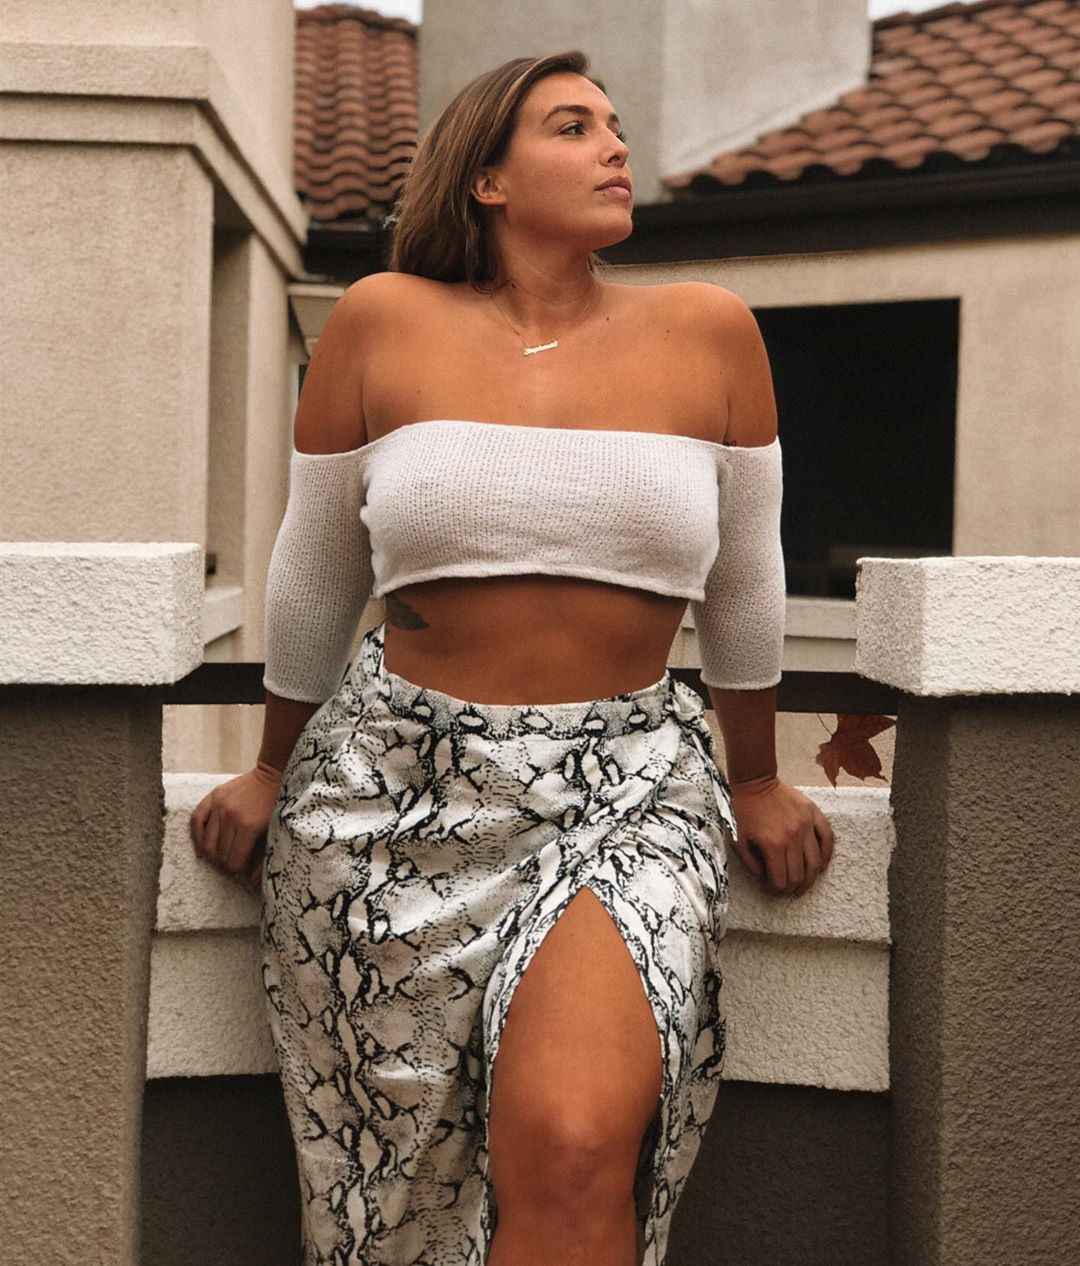 Stephanie Viada dress crop top dresses ideas, hot girls thighs